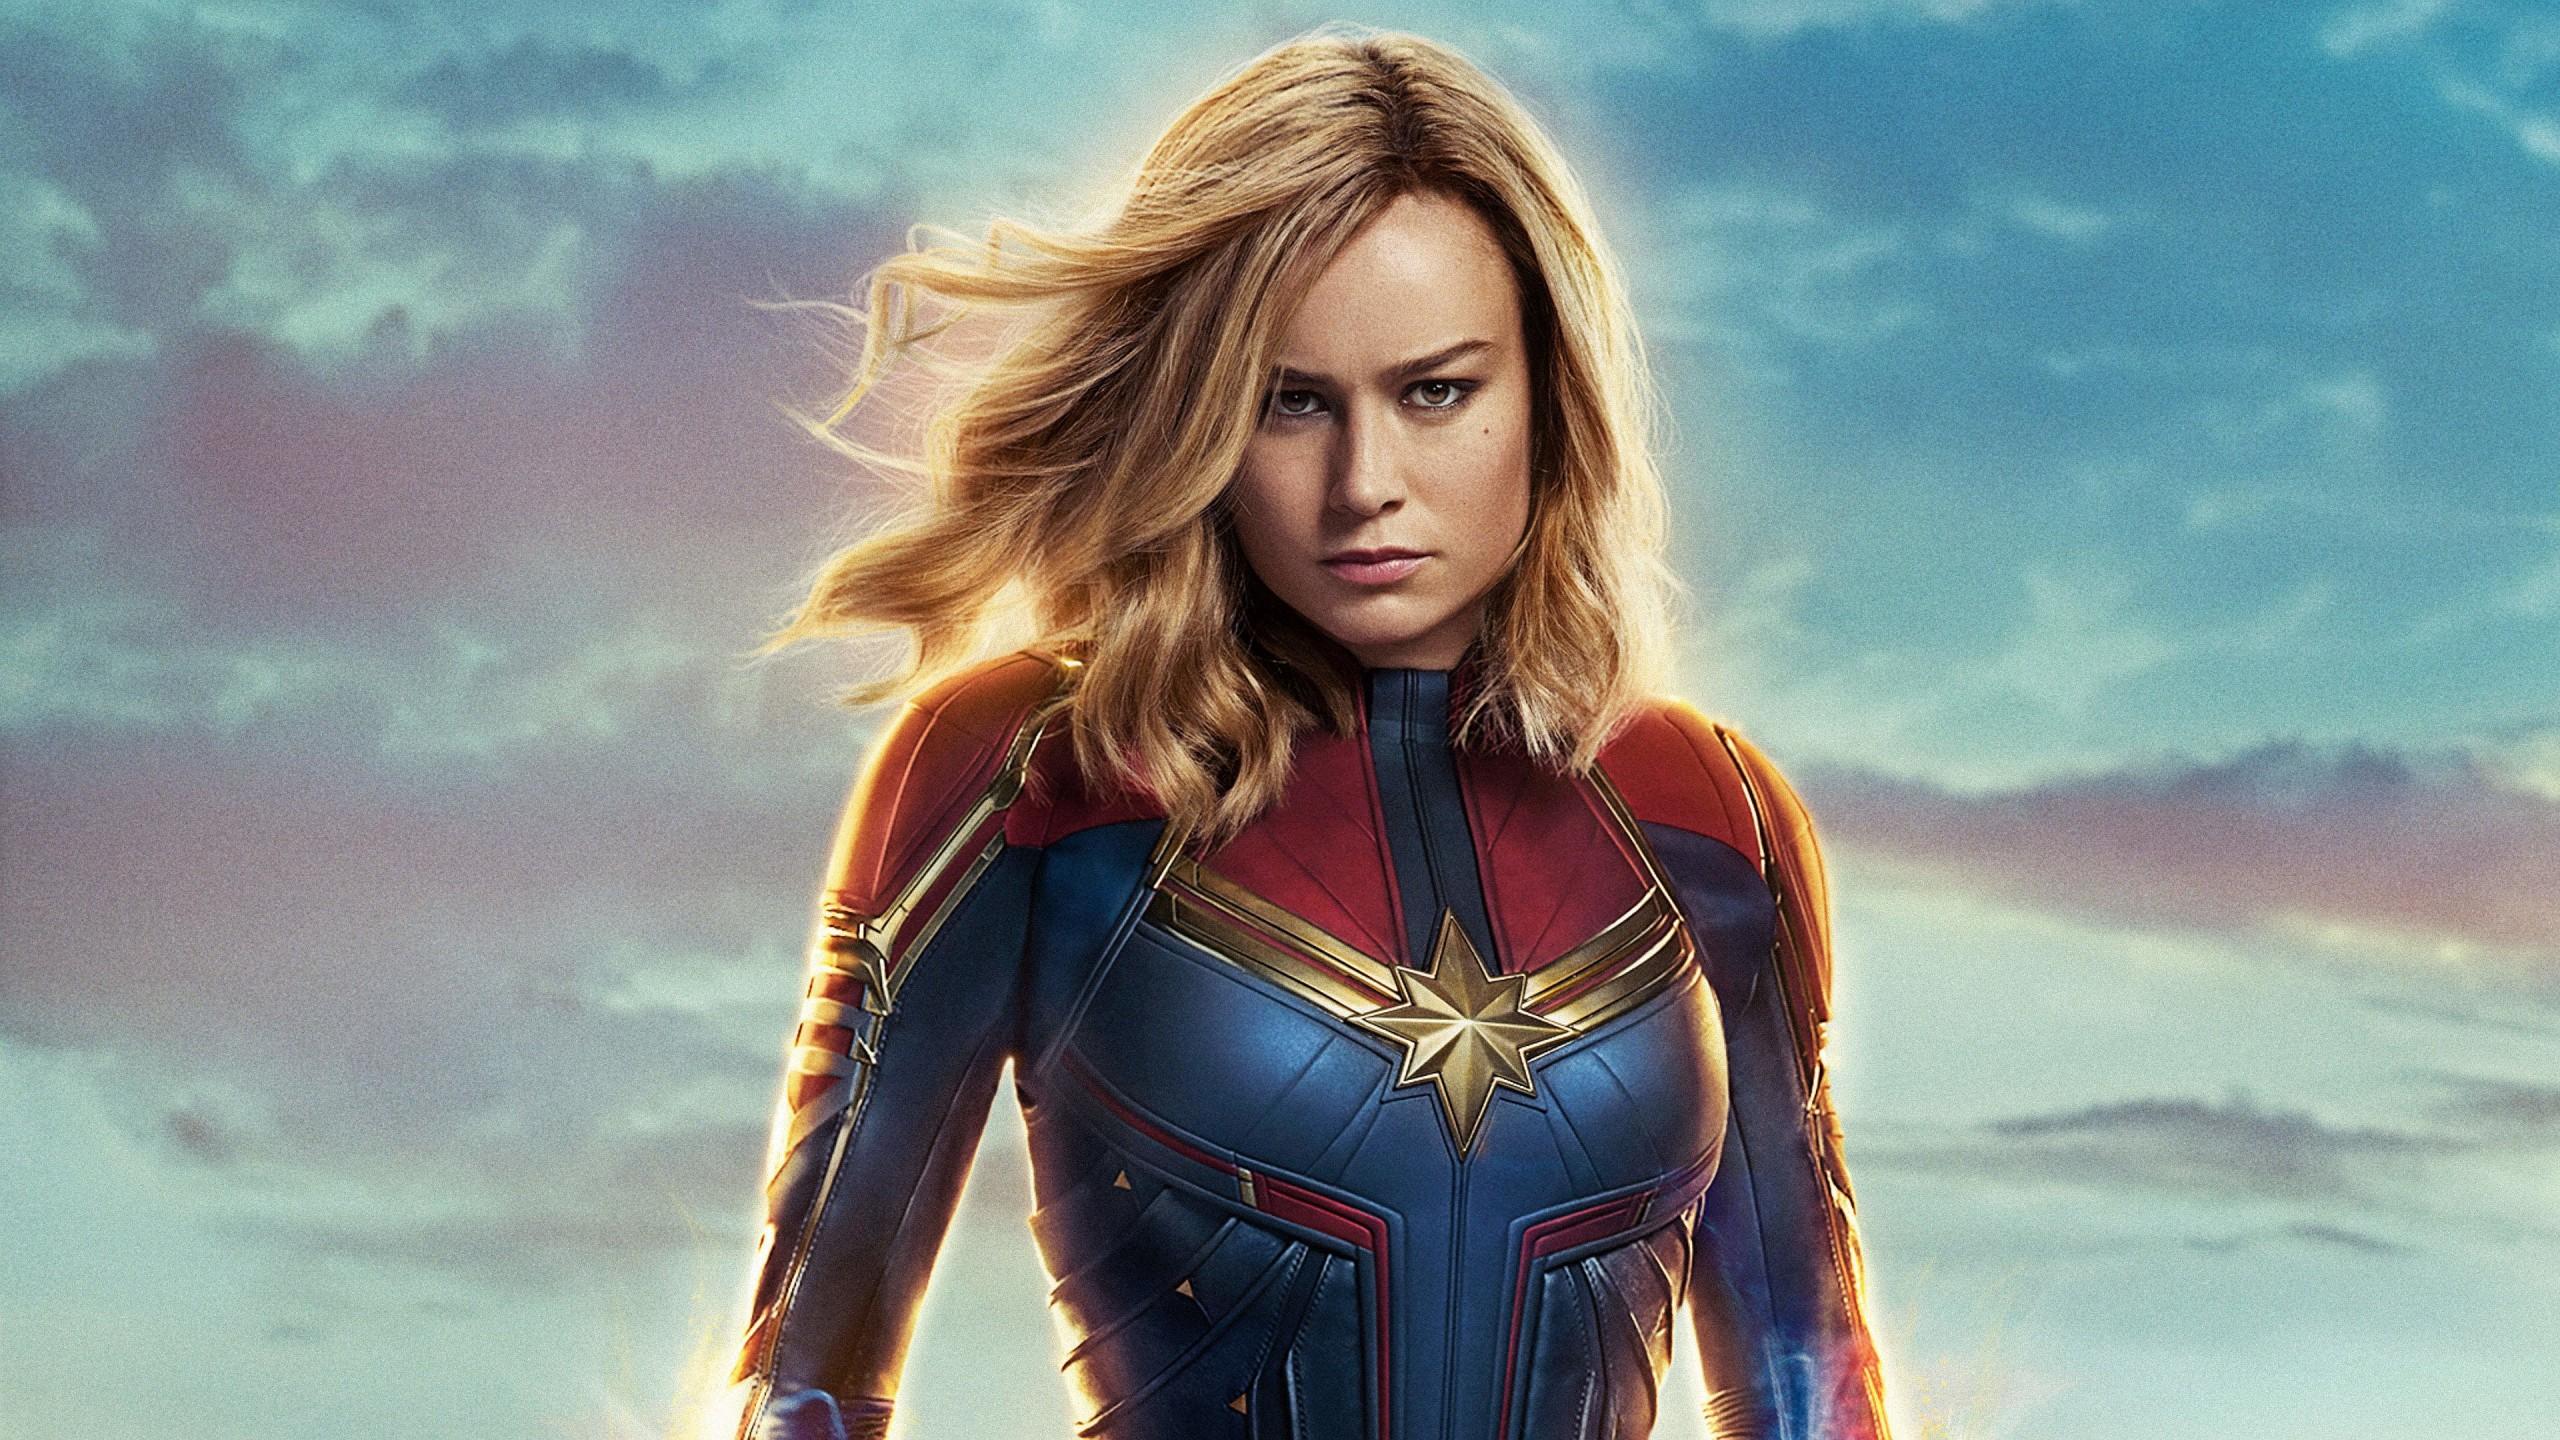 Wallpaper Captain Marvel Brie Larson 4k Movies 21113